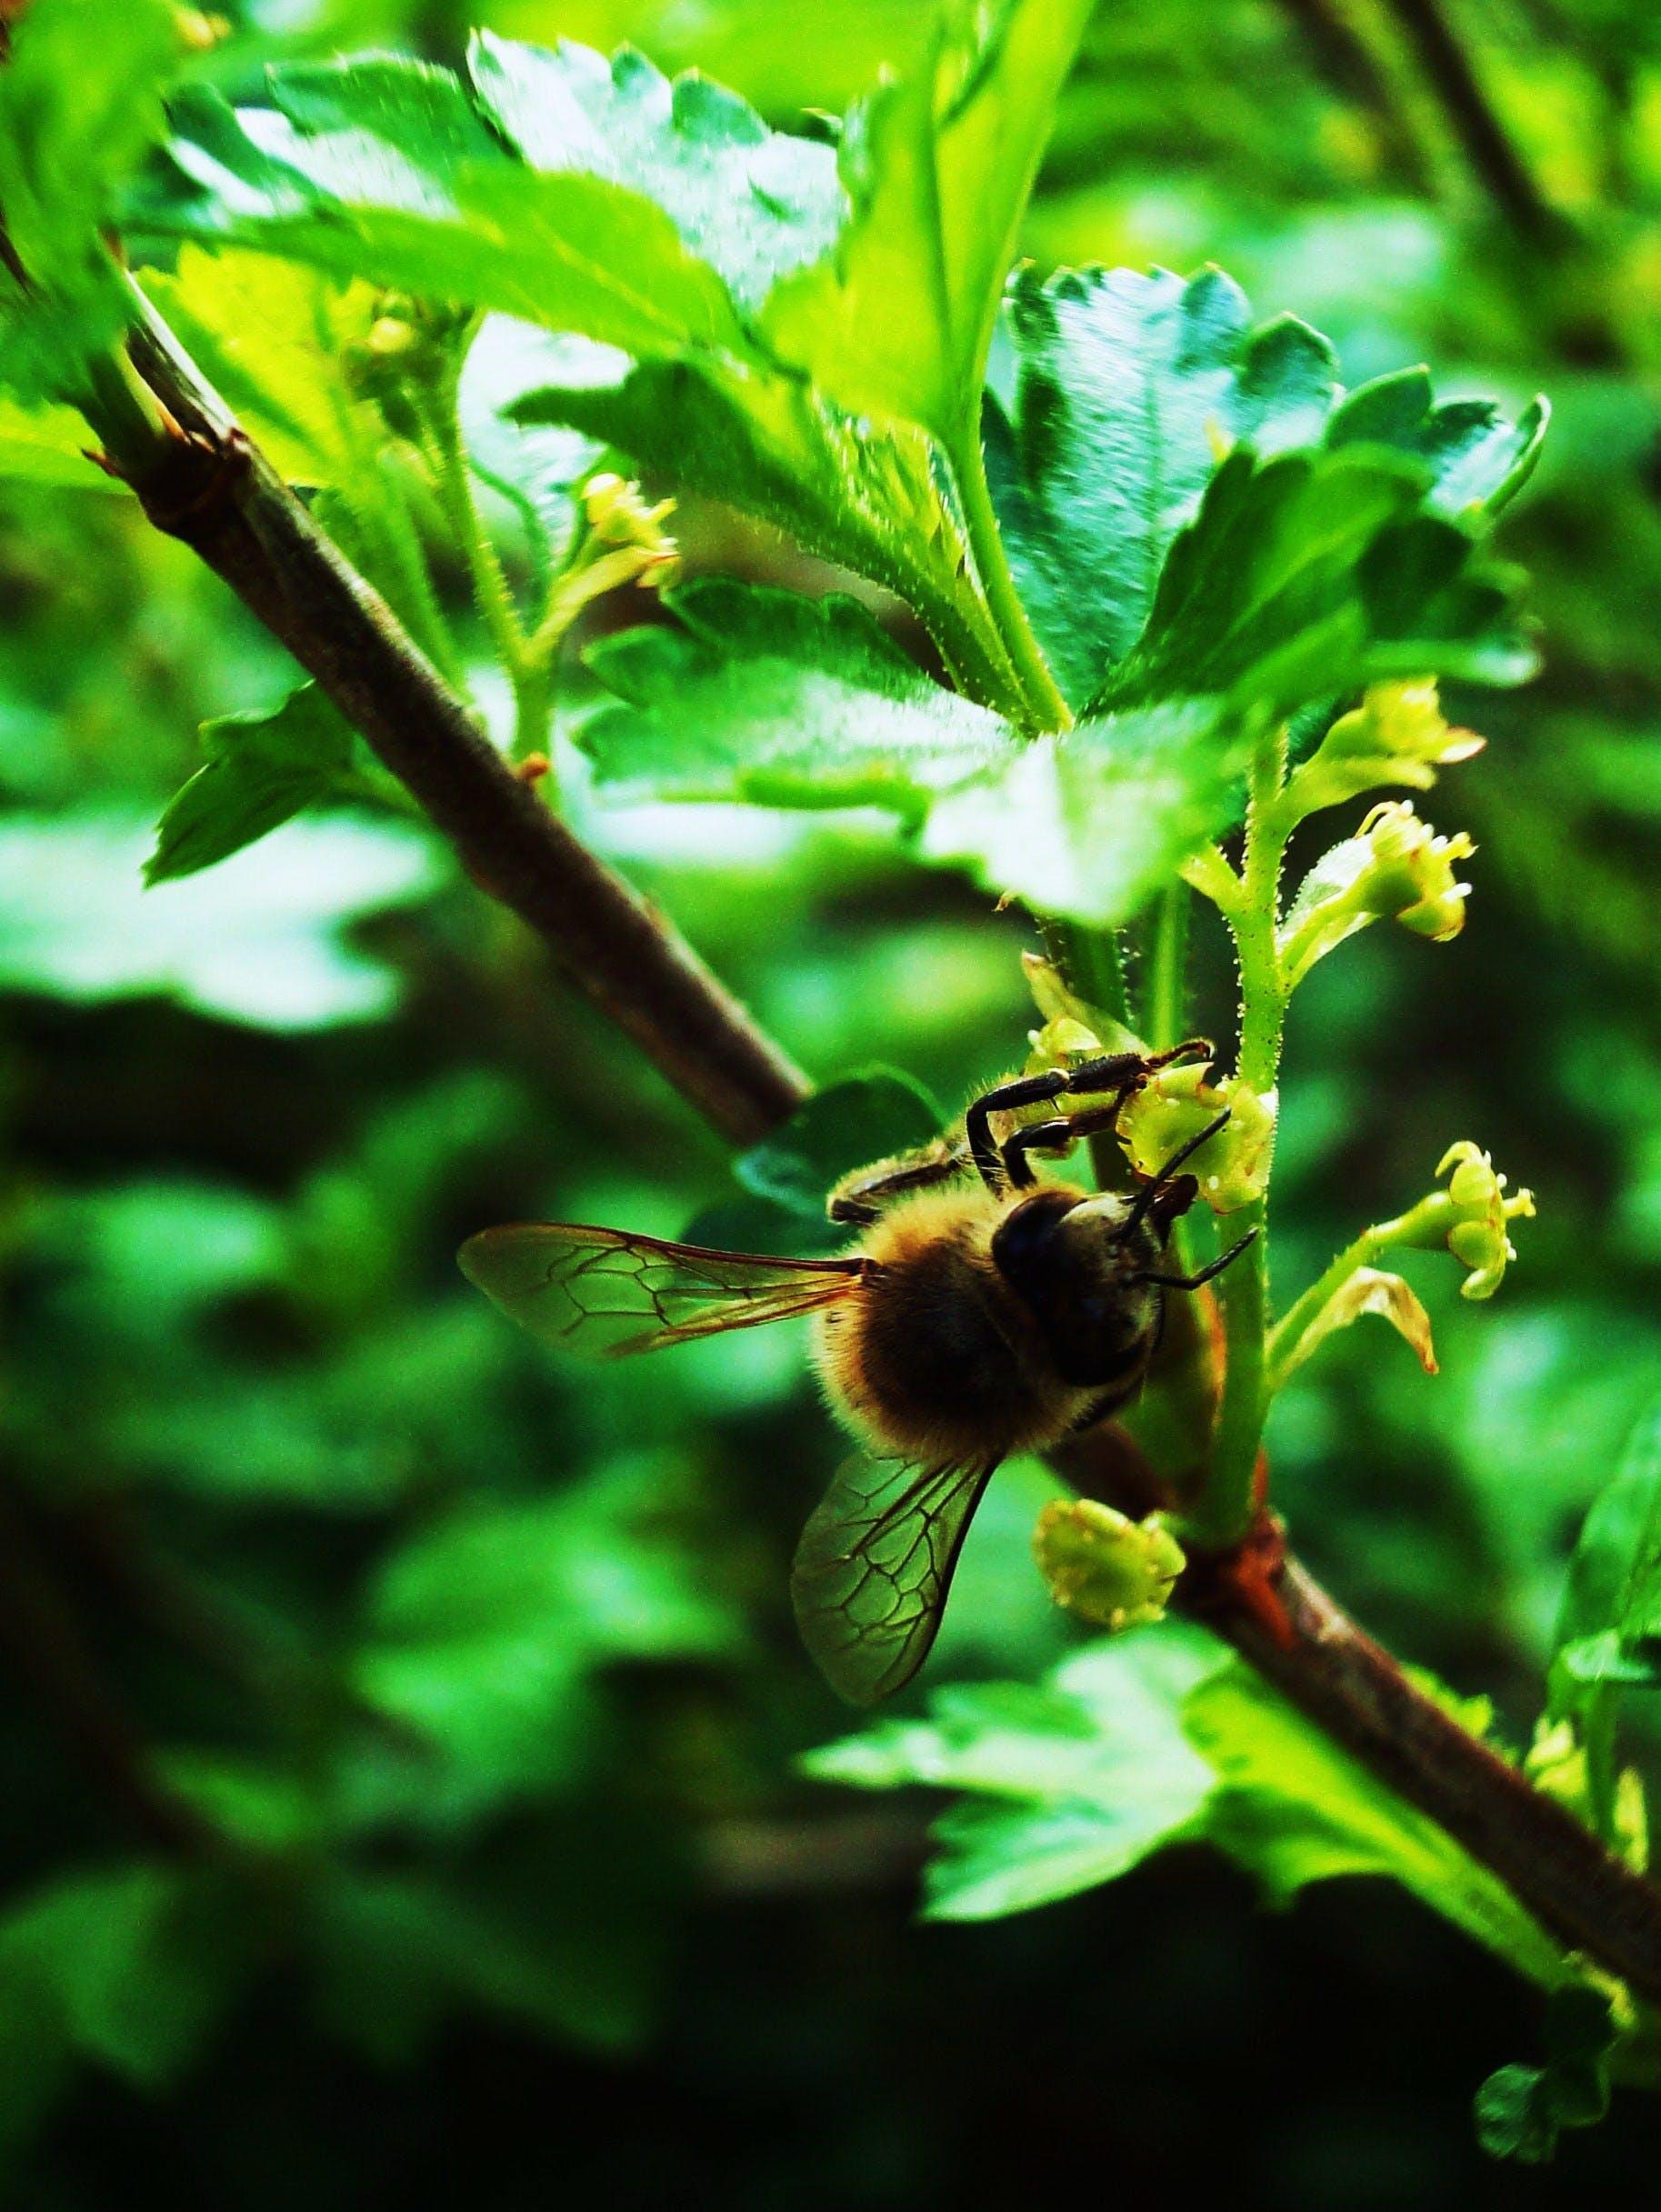 Free stock photo of flowers, green, bee, shrubs